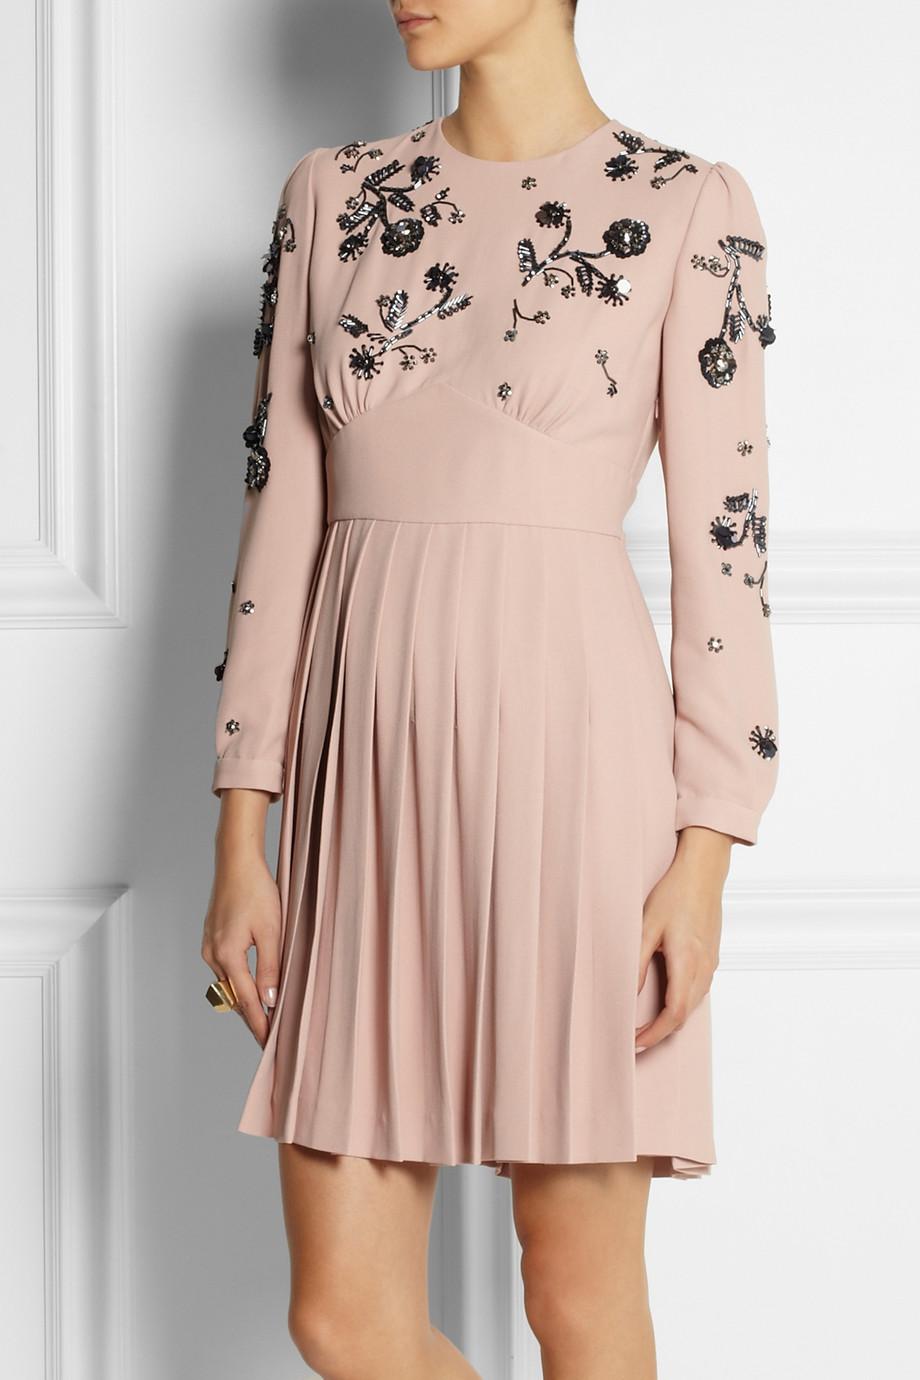 Lyst Miu Miu Embellished Cady Dress In Pink